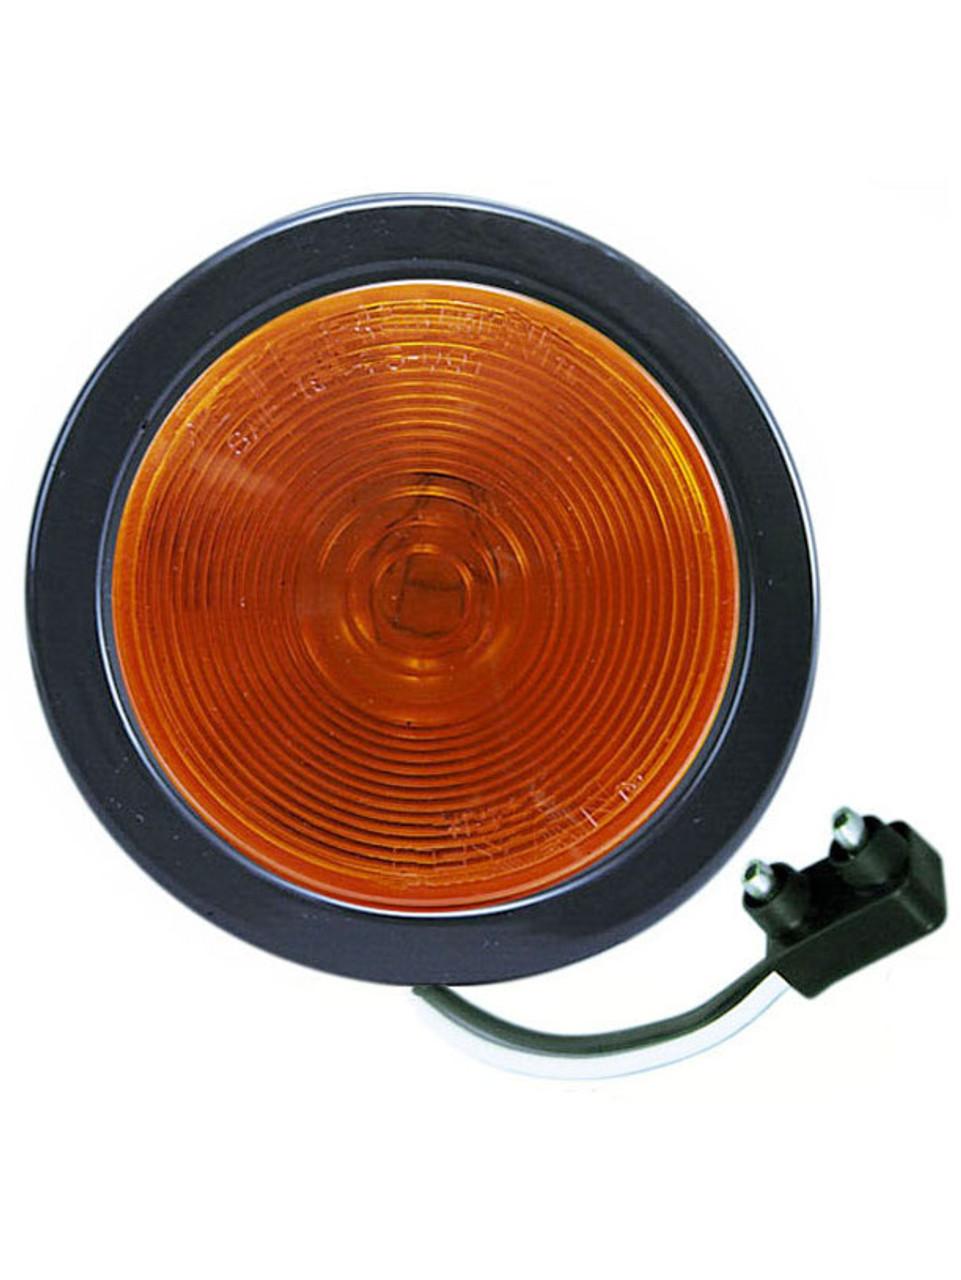 "LED143KA --- Round 2-1/2"" Sealed LED Clearance/Side Marker Light Kit - 3 Diodes"